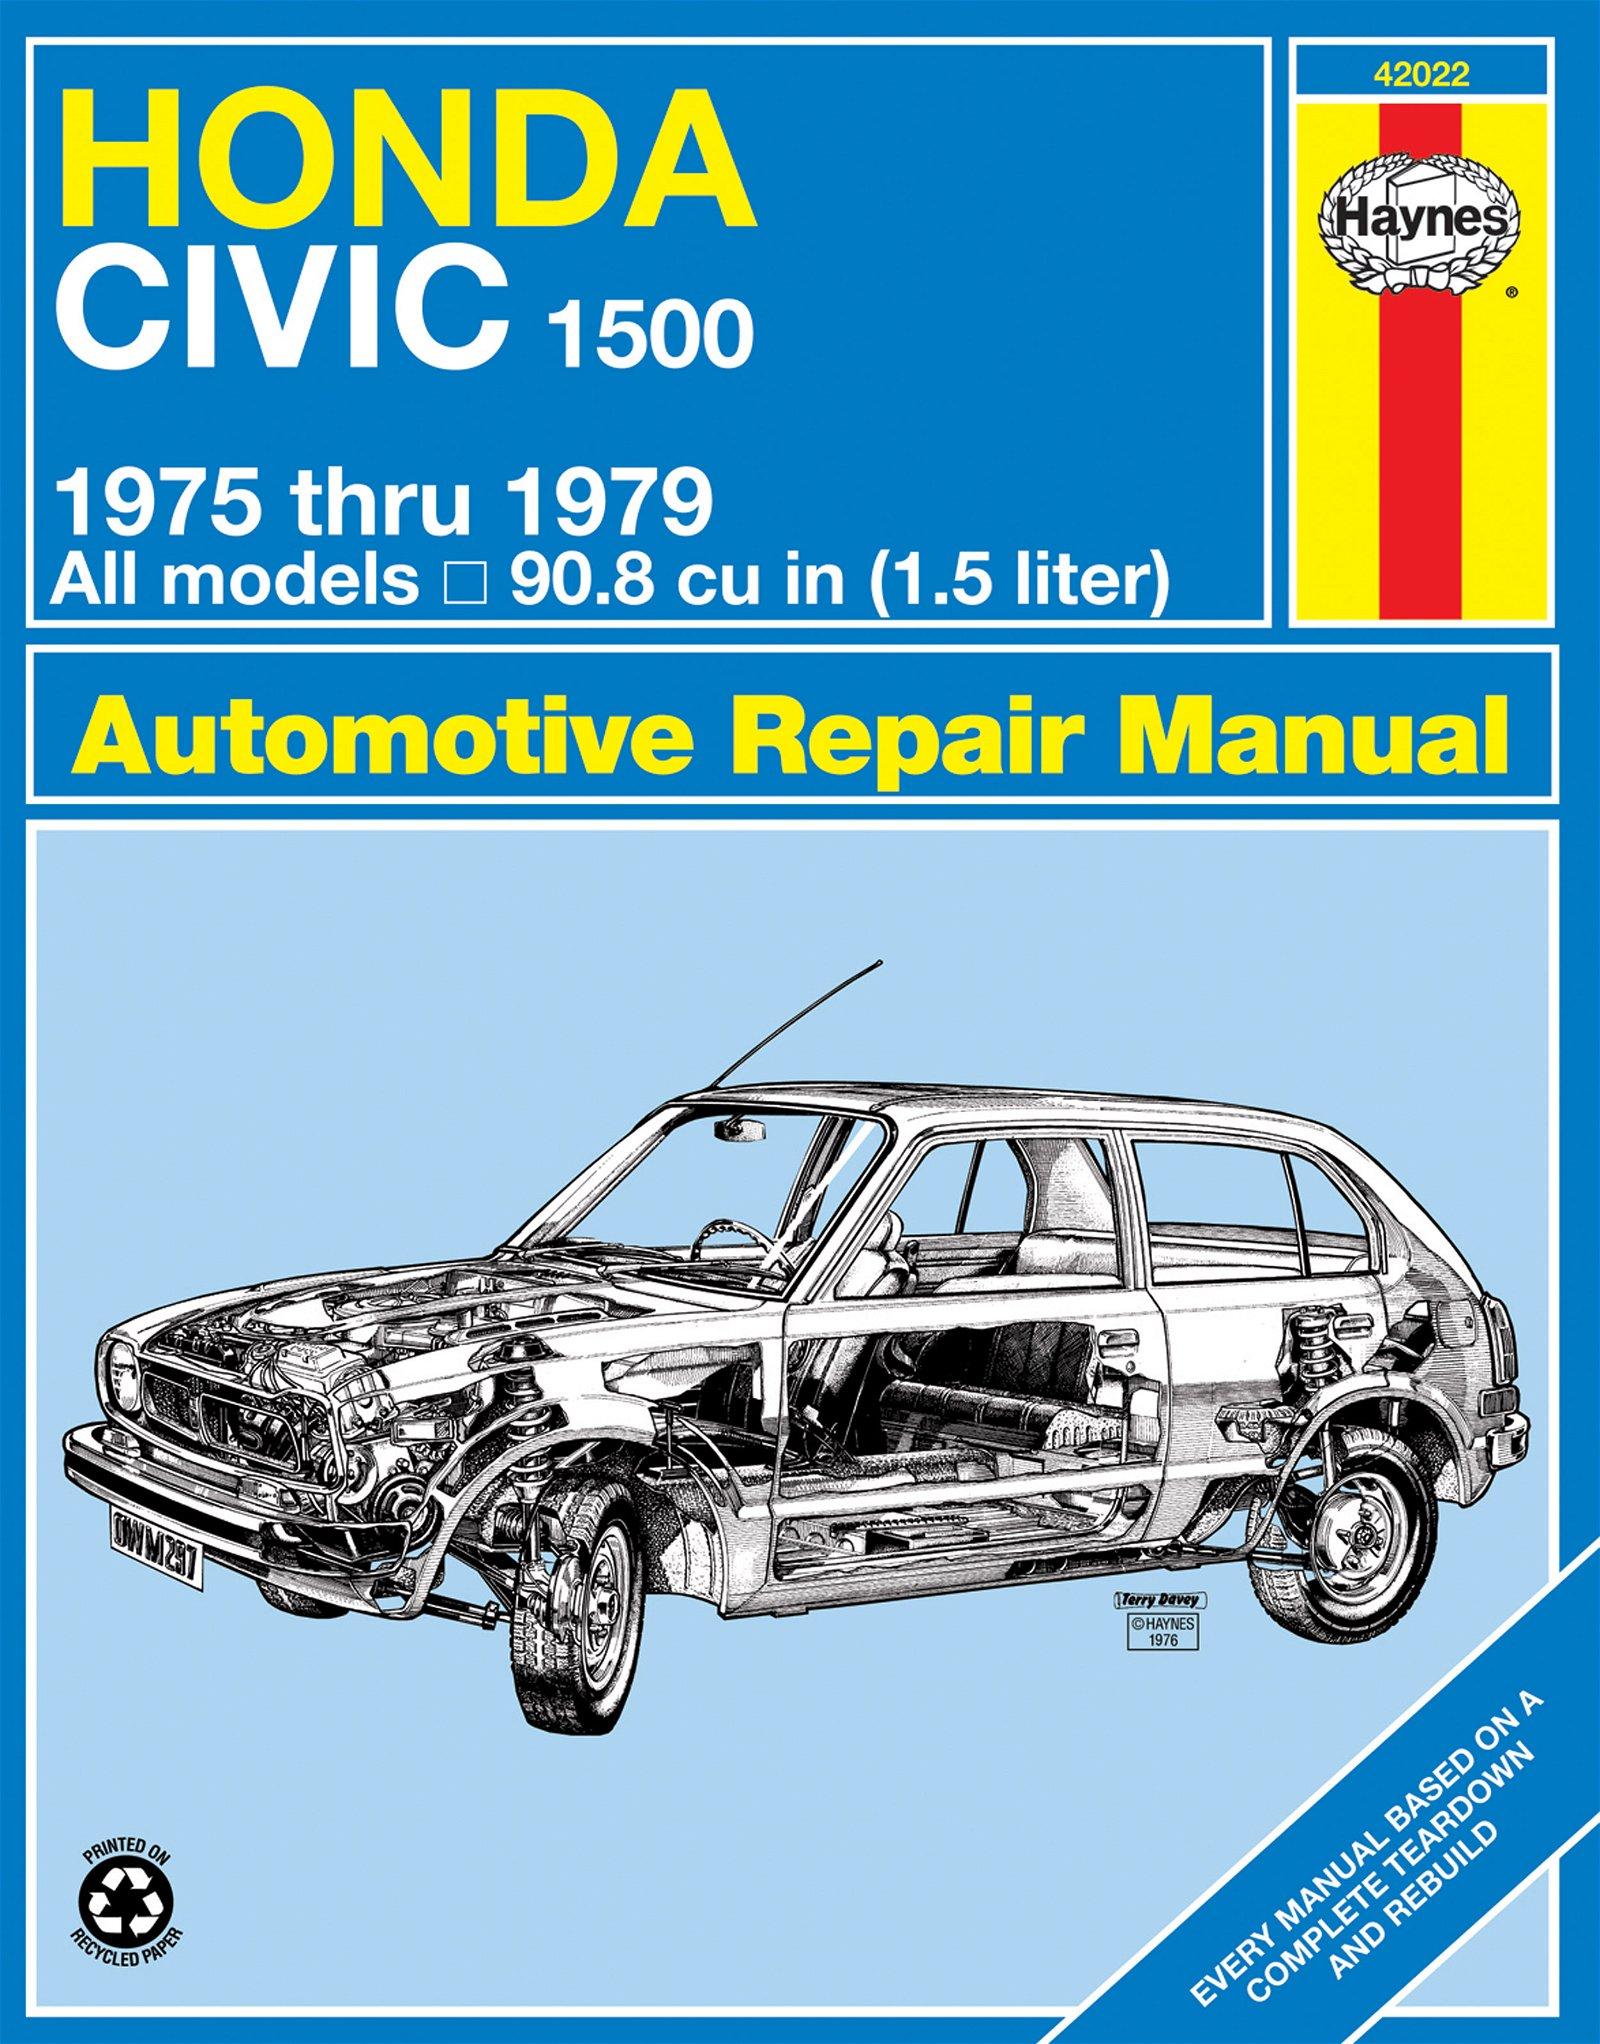 [Manuel US en Anglais] Honda Civic 1500 CVCC  '75 -  '79